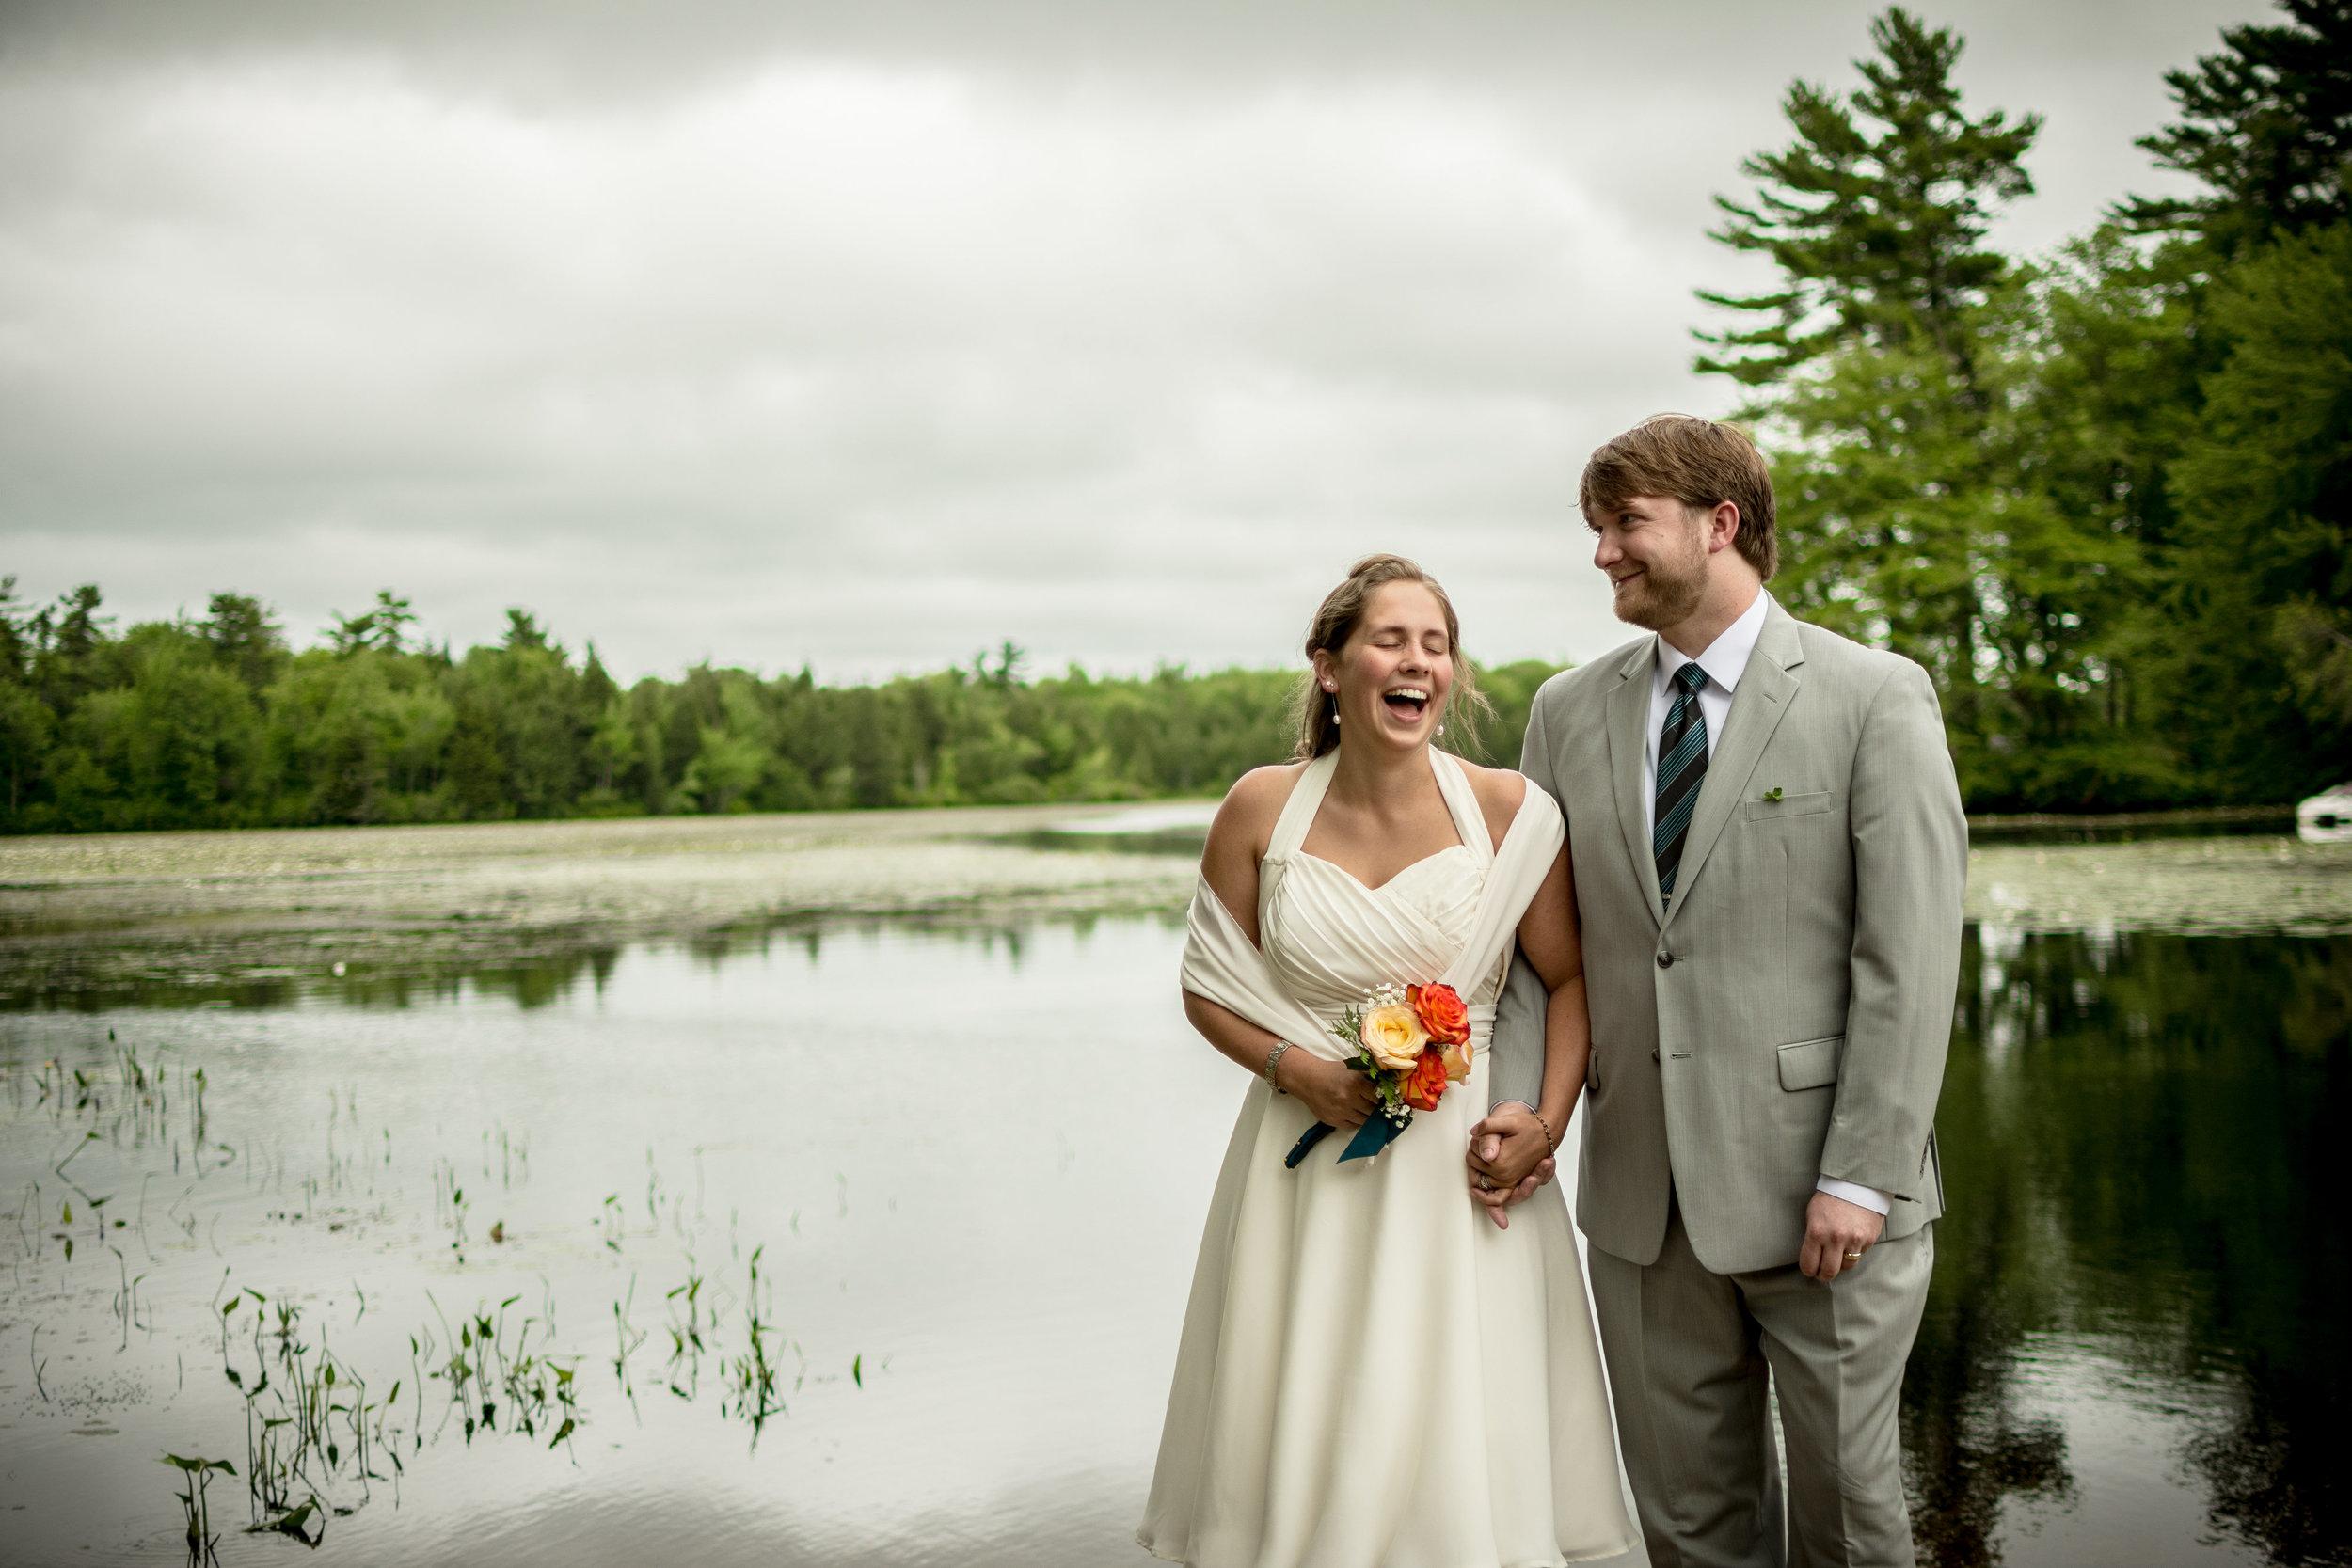 Ariele and Josh on their wedding day